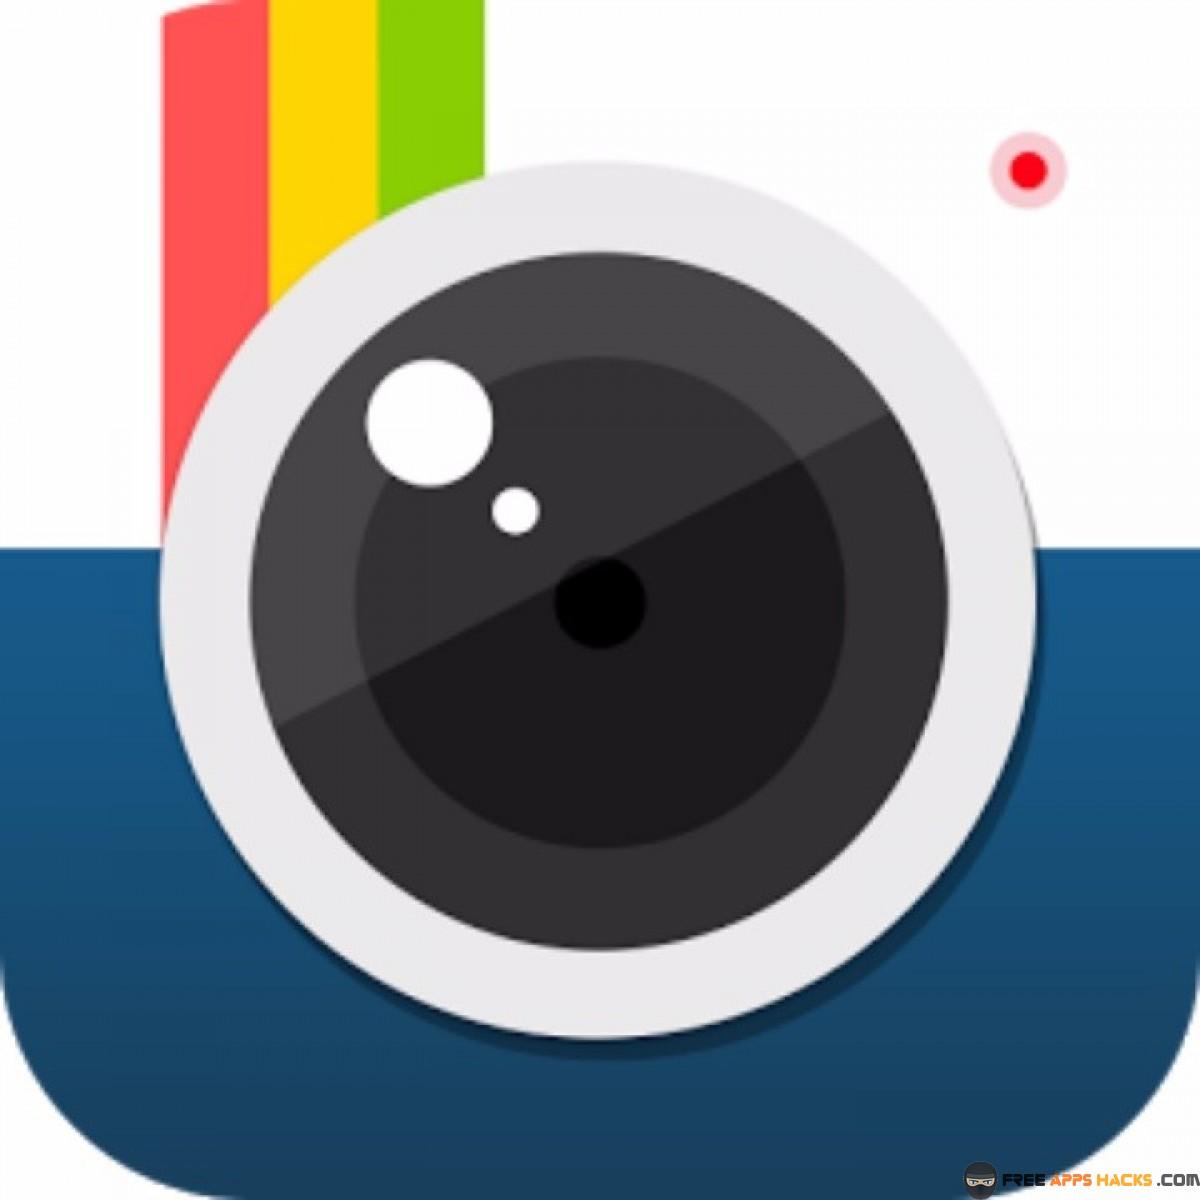 Download itek Motorized Camera app apk latest version V8